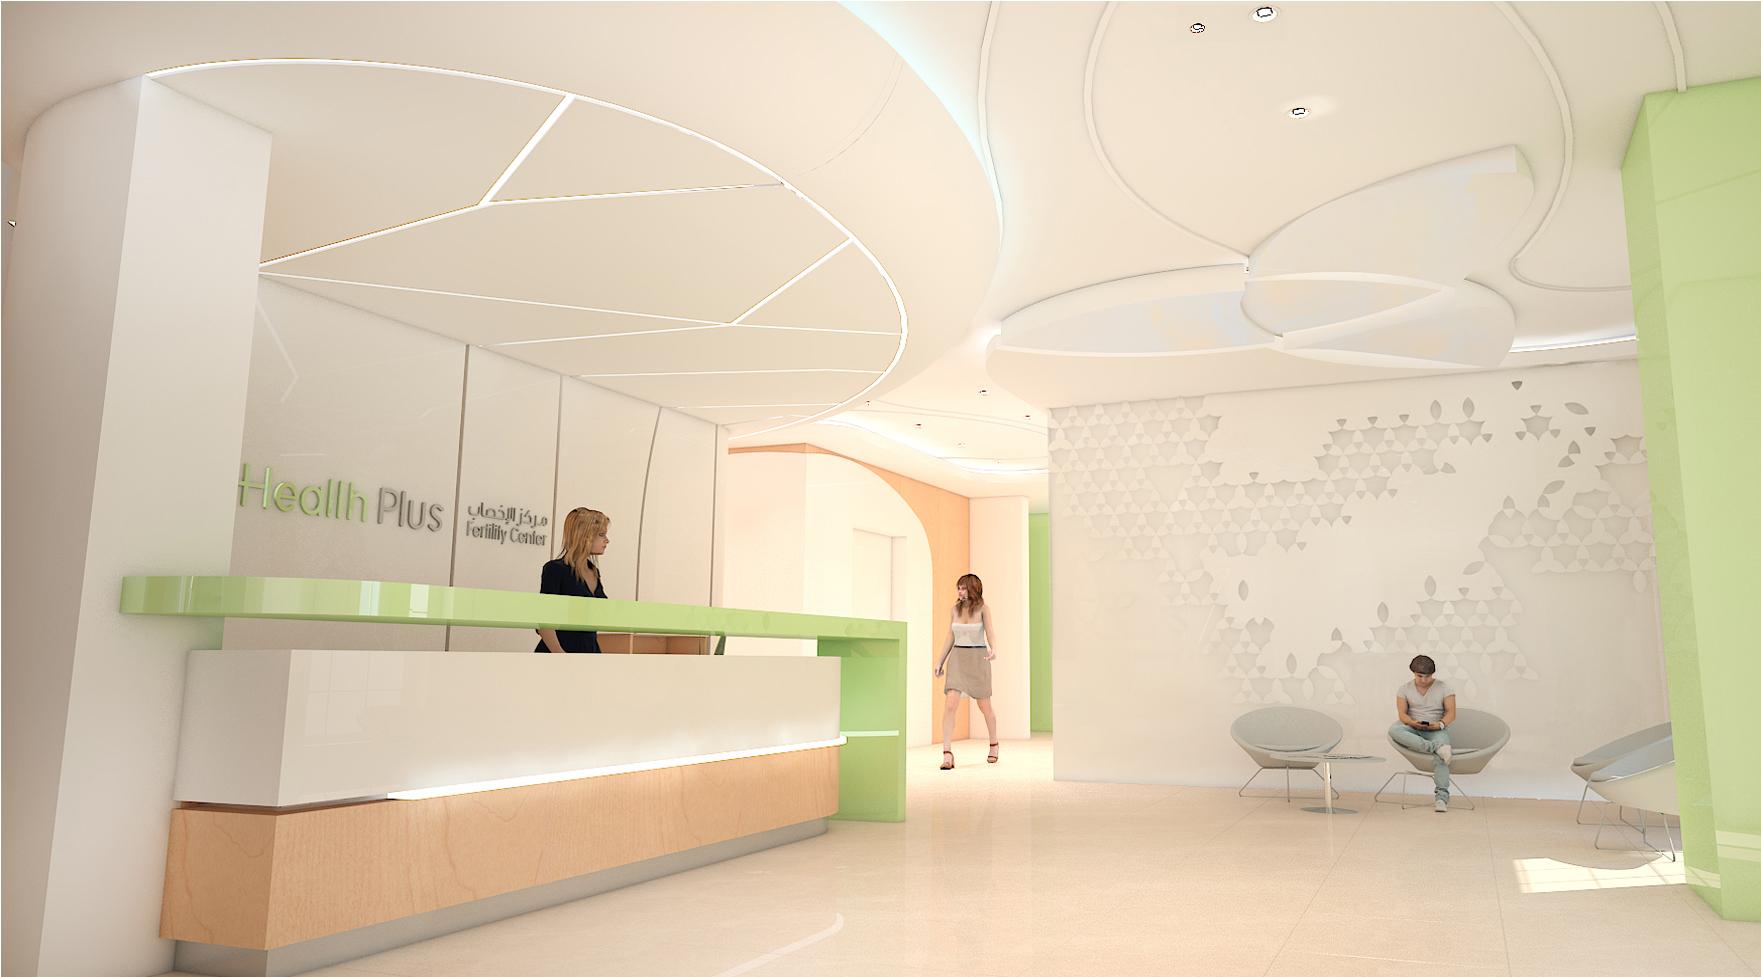 HealthPlus IVF Fertility Center, Villa 1, 2 & 3